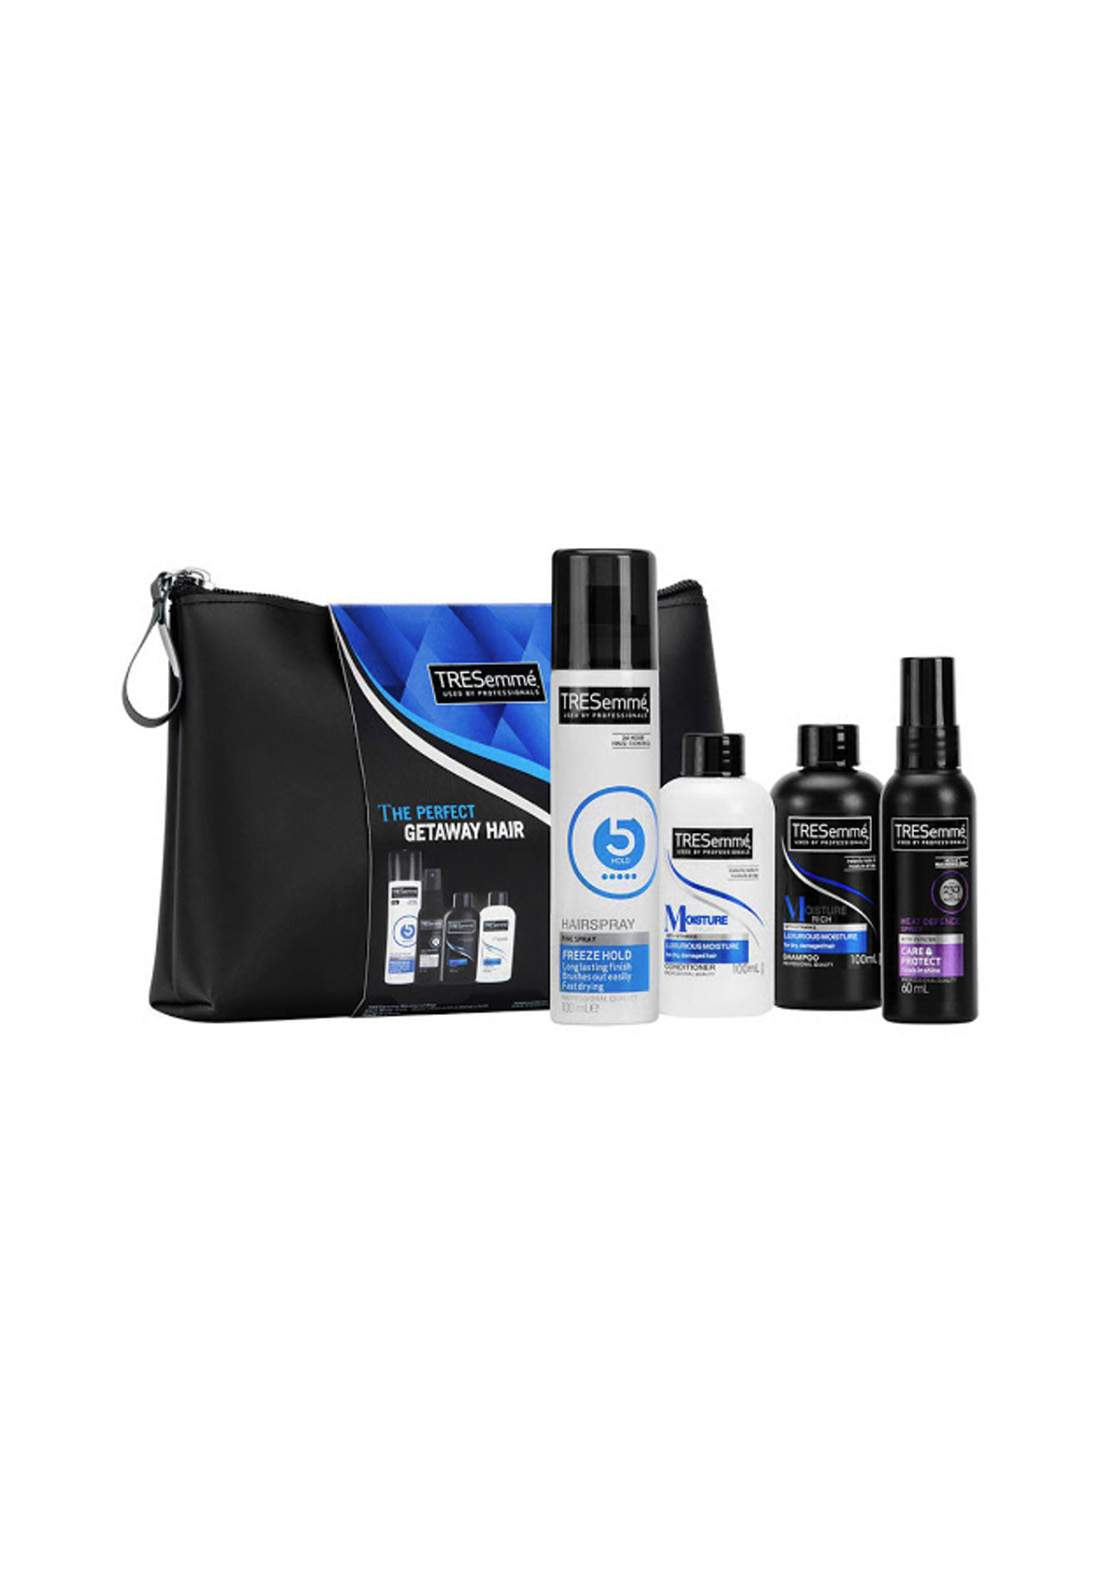 Tresemme (68270417) Hair Styling Travel Essentials Gift Set مجموعة هدايا تصفيف الشعر